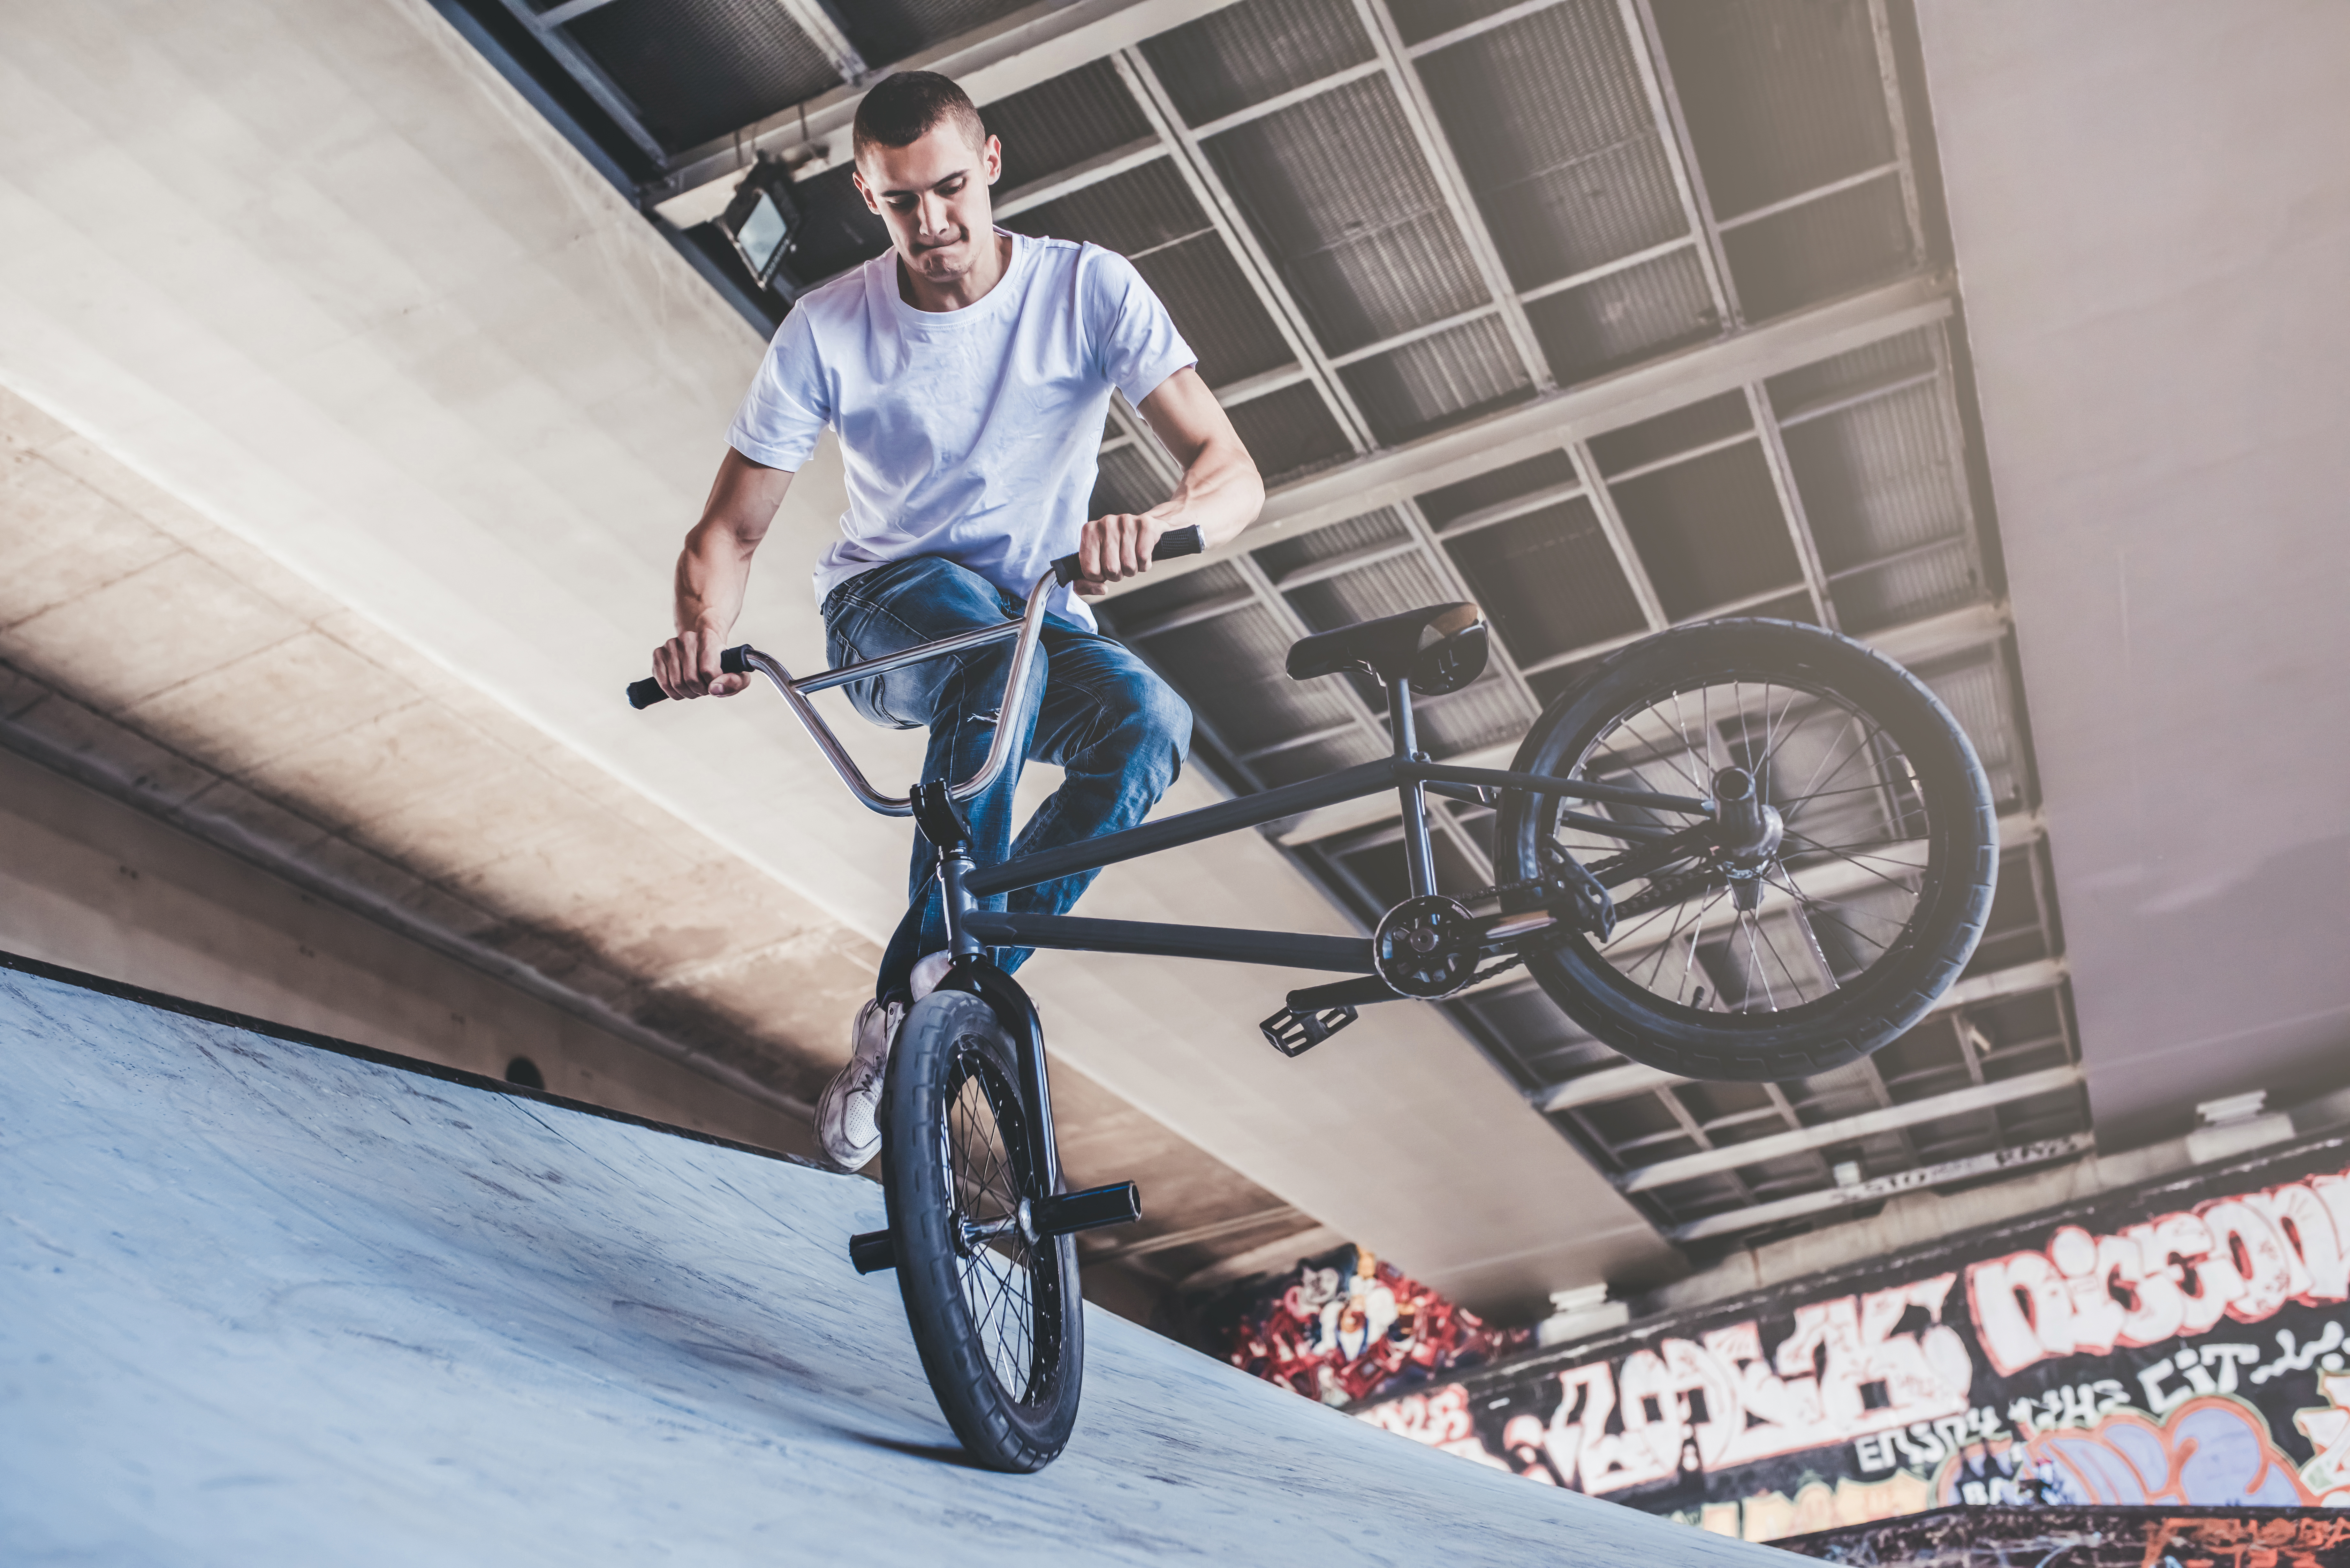 BMX Bike Stunt Pegs Grinding Freestyler Trick Nuts 10//14mm Axle 110mm Length